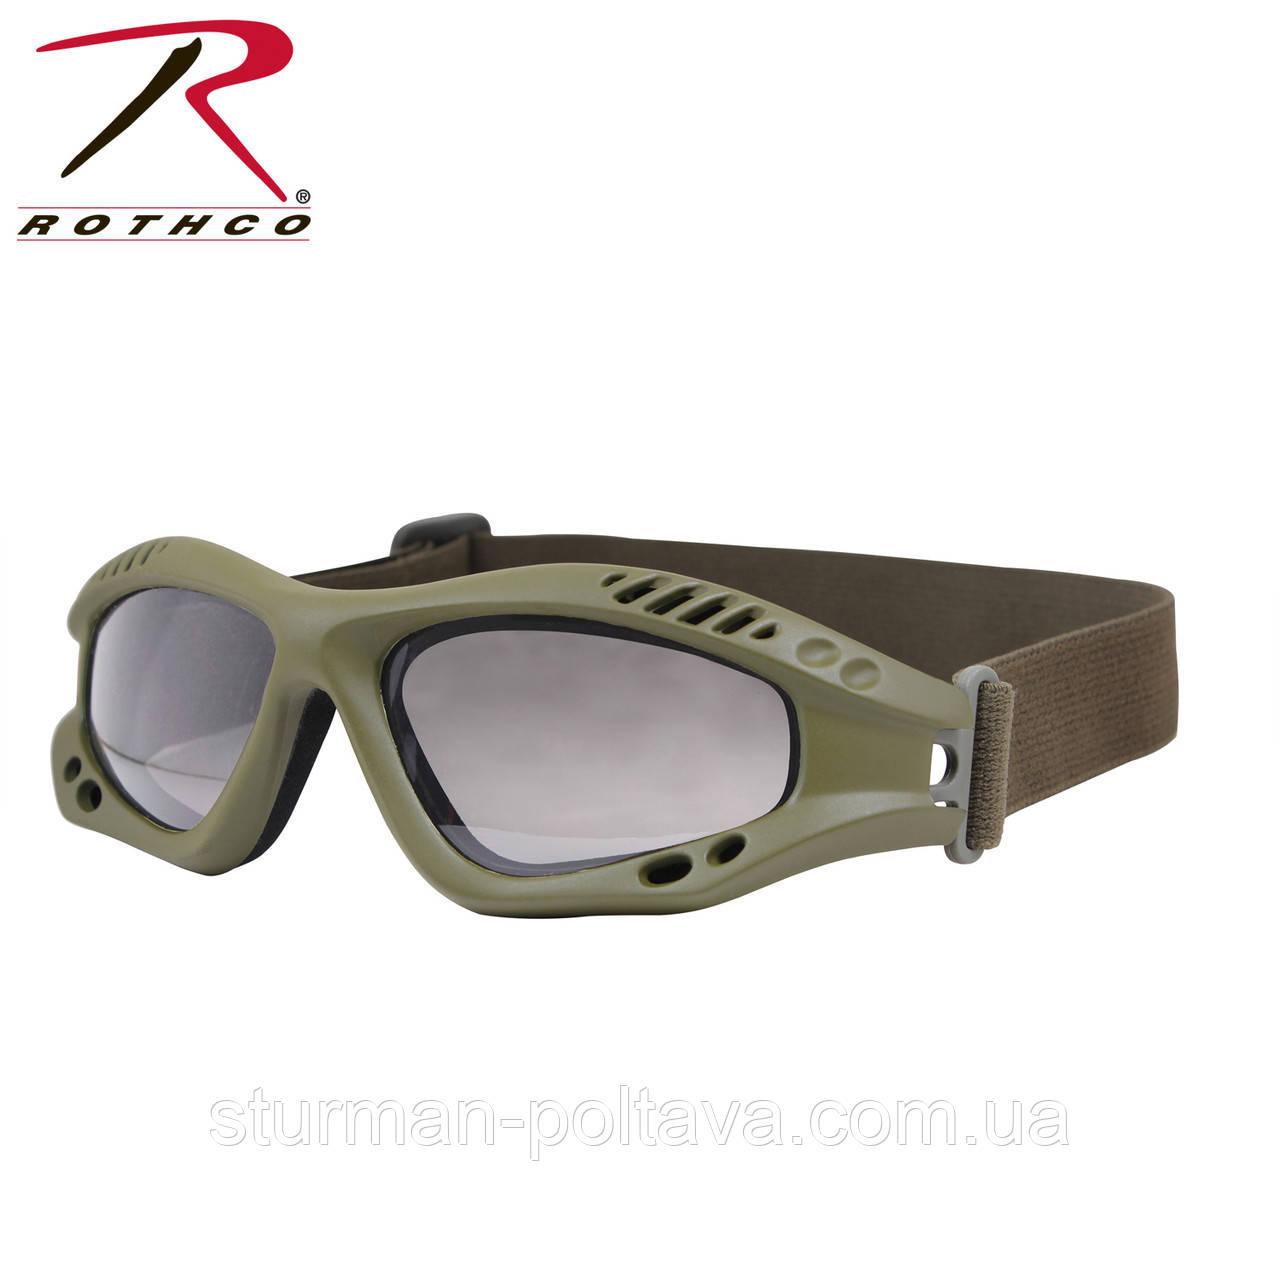 Тактические очки олива  Rothco Ventec